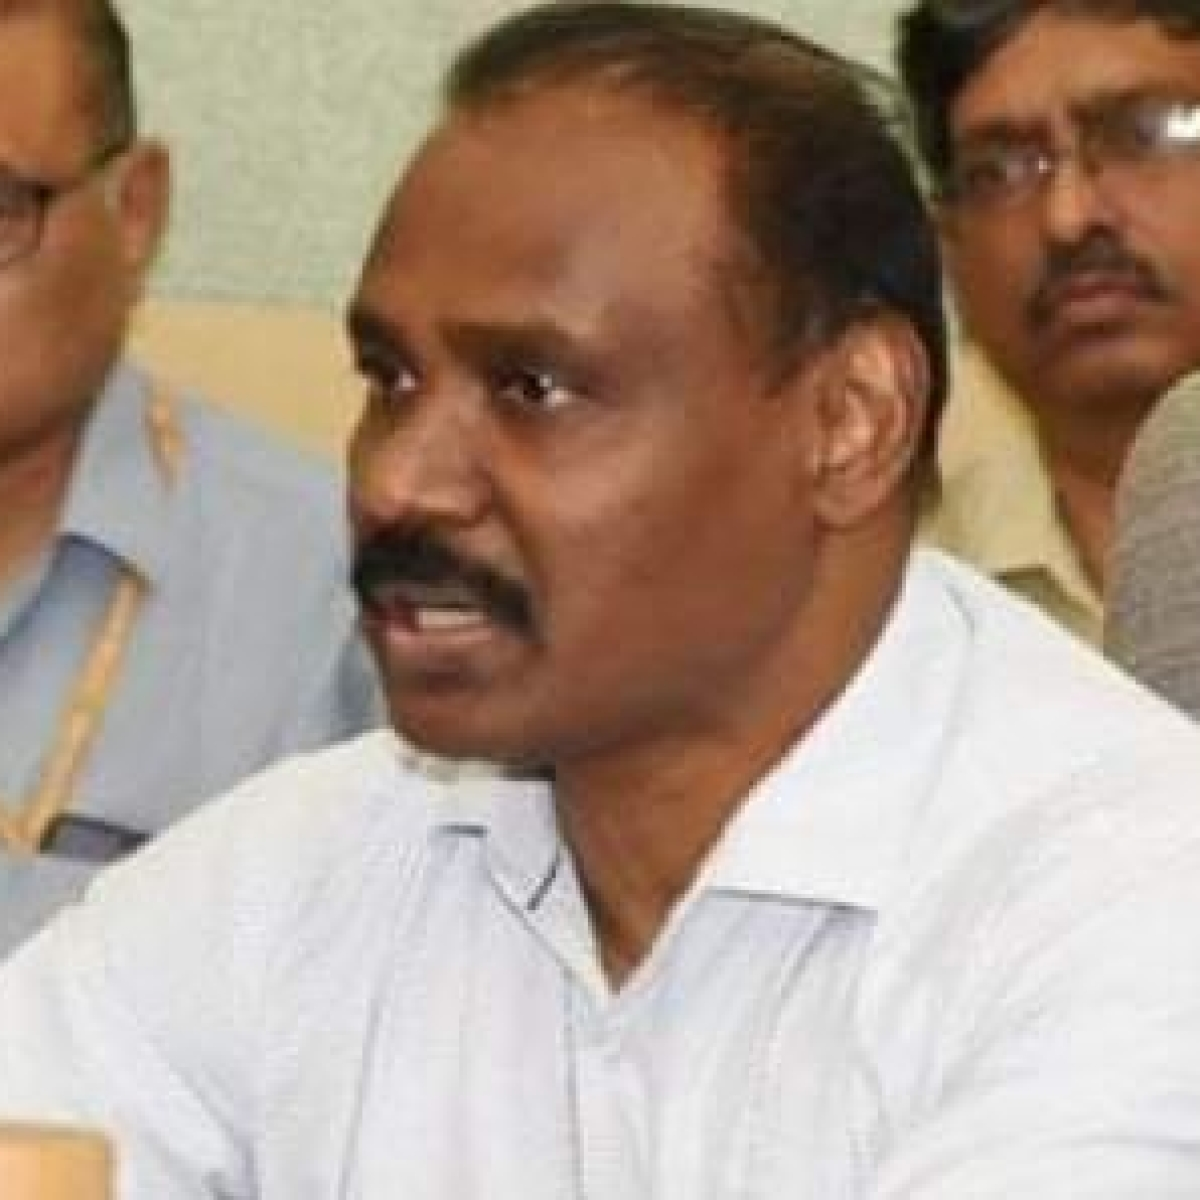 Lt. Governor calls for increased surveillance in JK